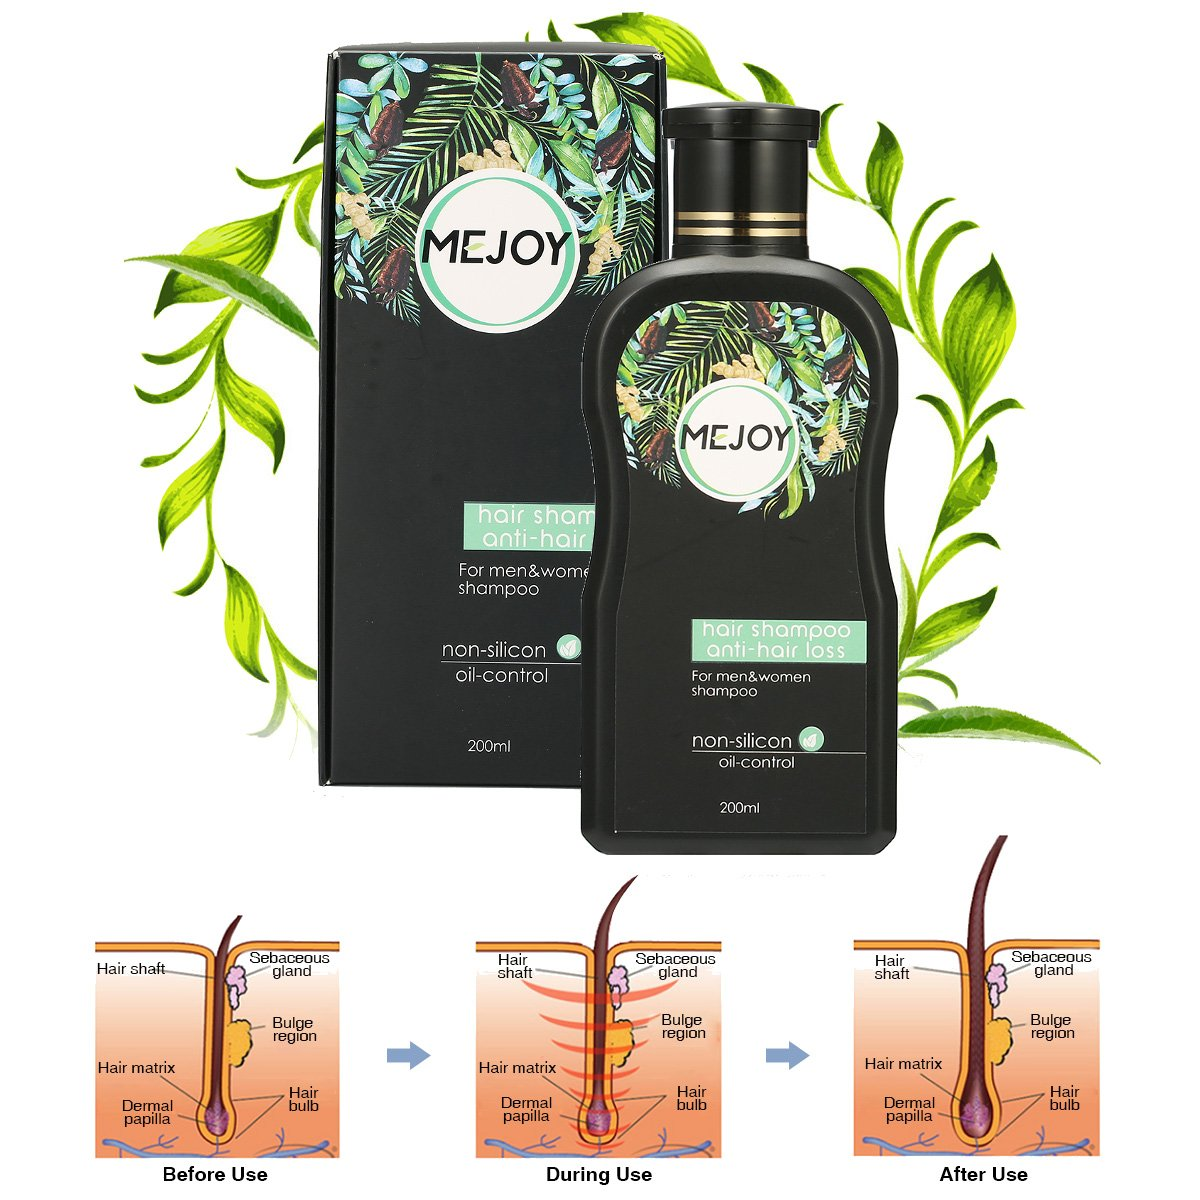 Anti-Hair Loss Shampoo For Men & Women, LuckyFine – Contains Herbal Ingredients, Helps Stop Hair Loss, Hair Growth, Stimulates Hair Re-growth Dandruff Treatment 200ML